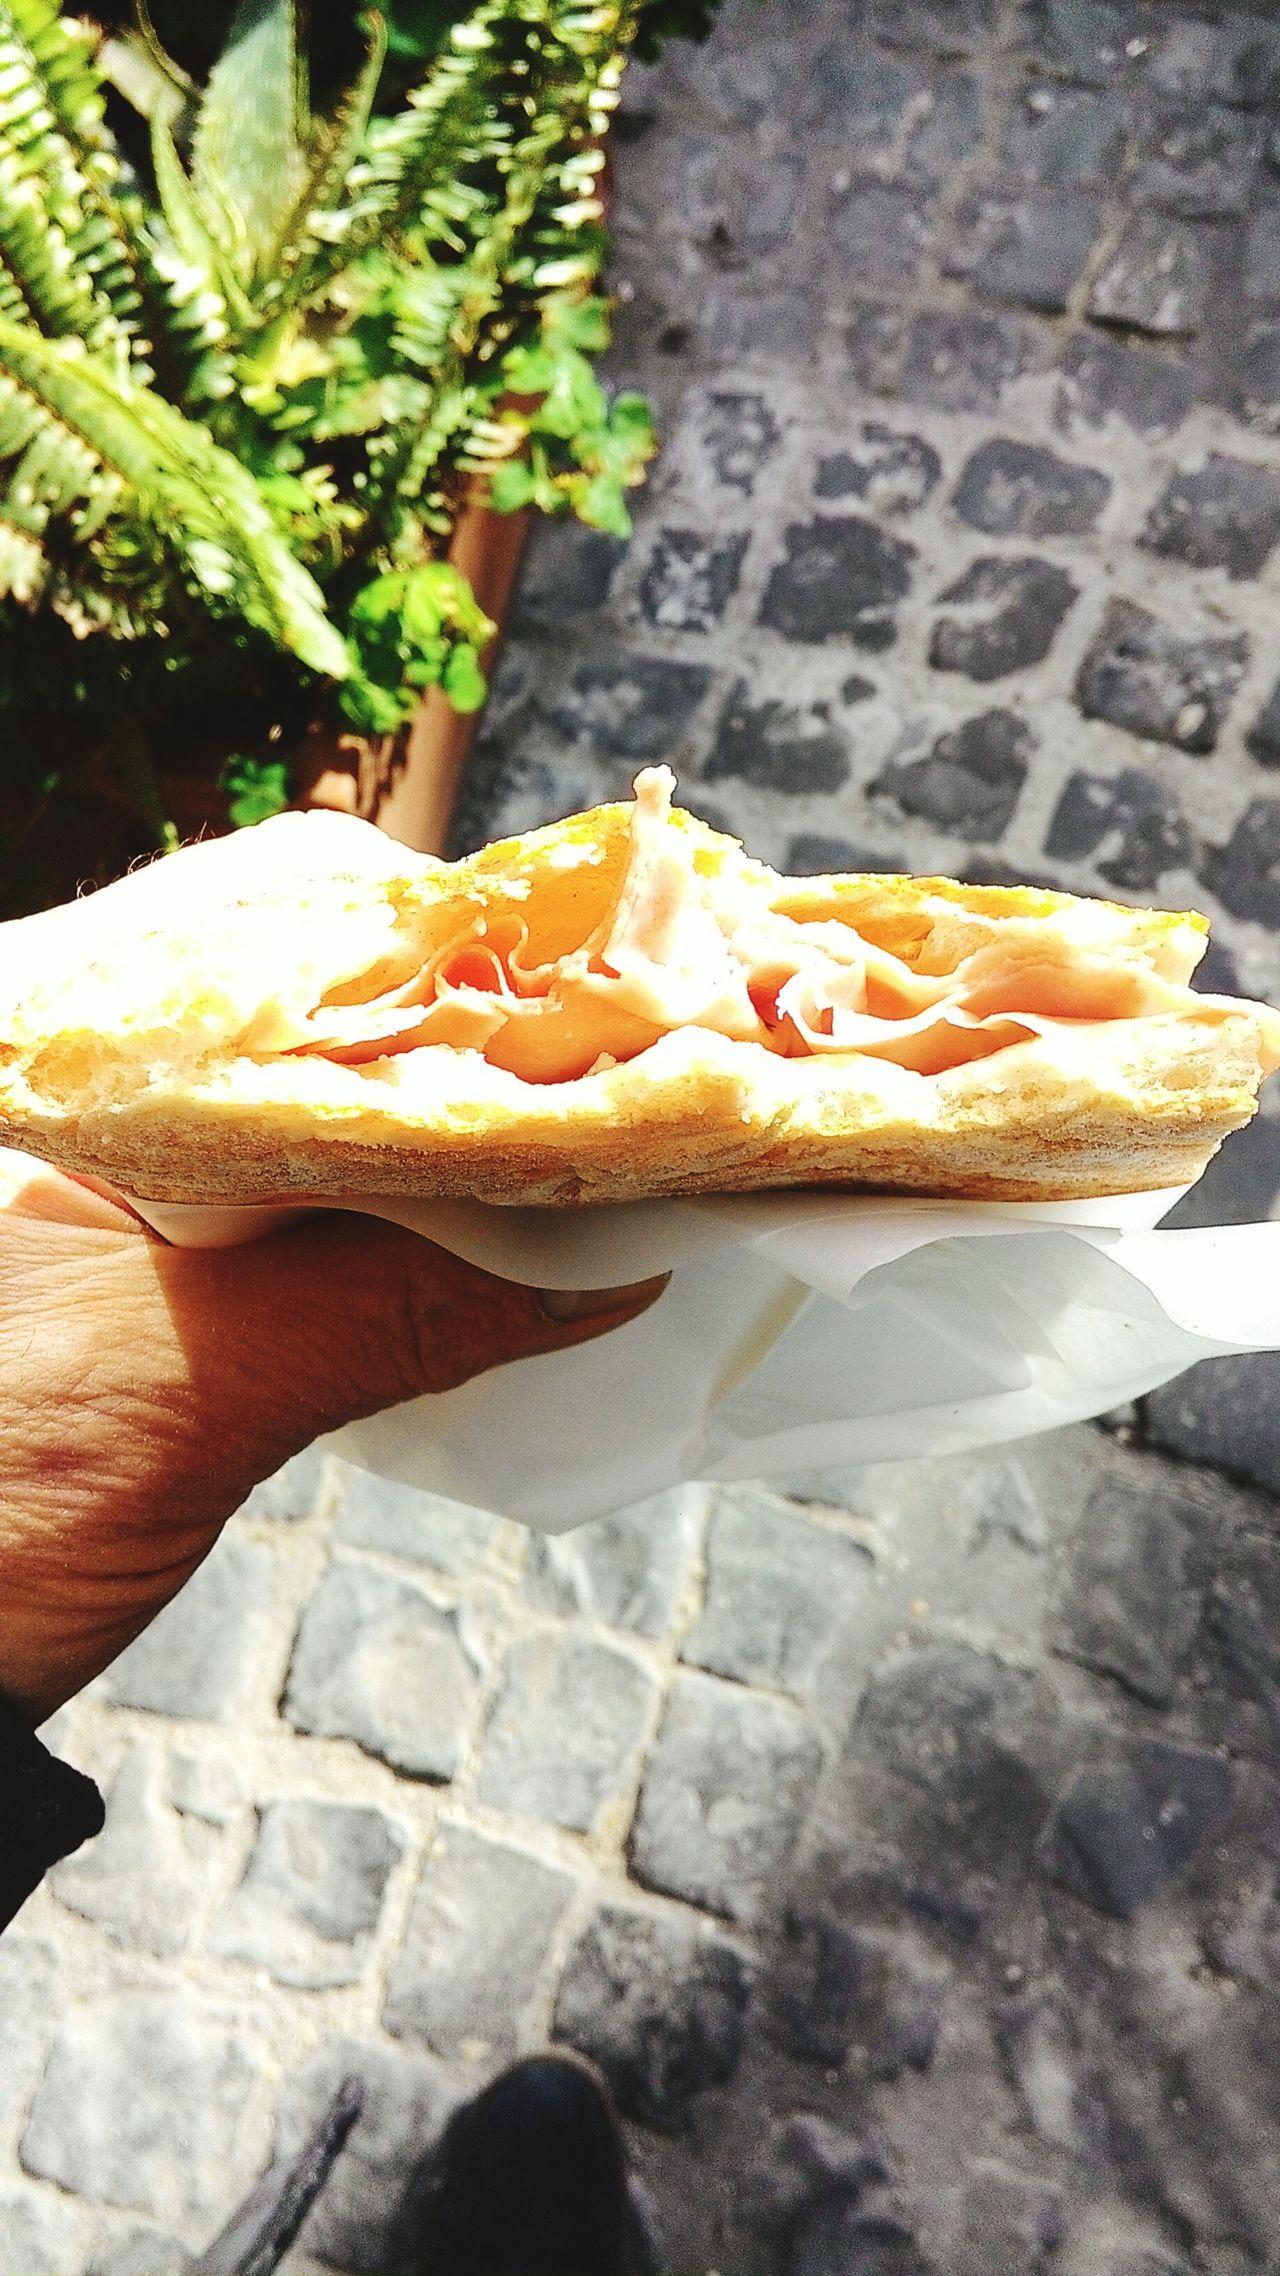 Street Food in Rome near Trevi fountain.